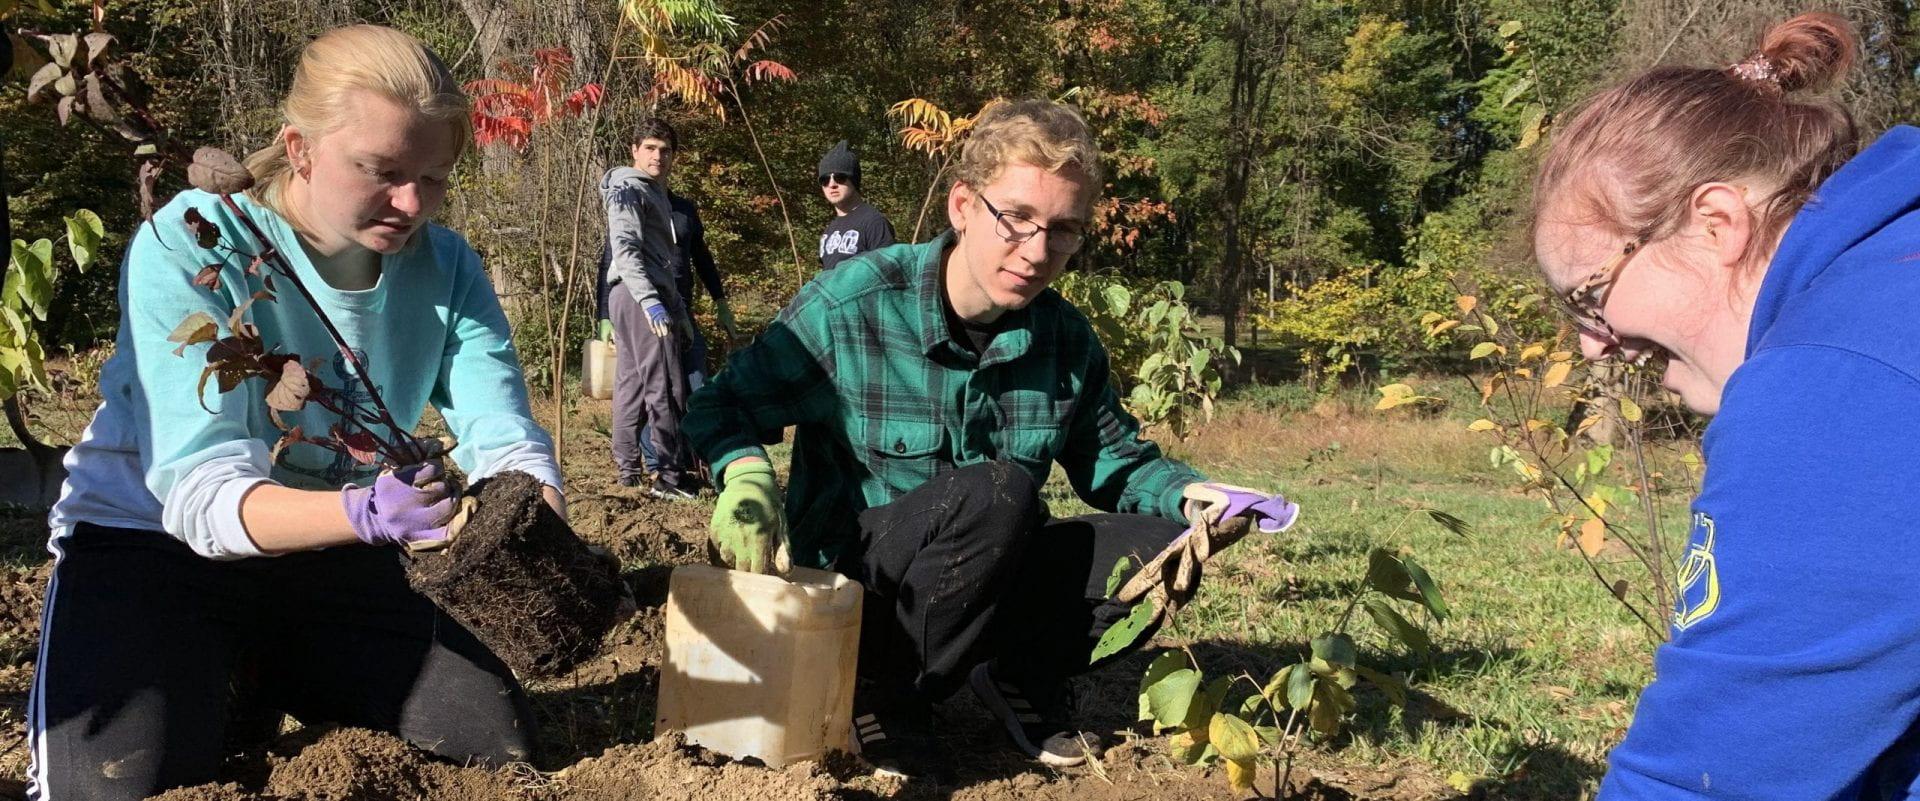 Alpha Phi Omega members kneeling and planting greenery